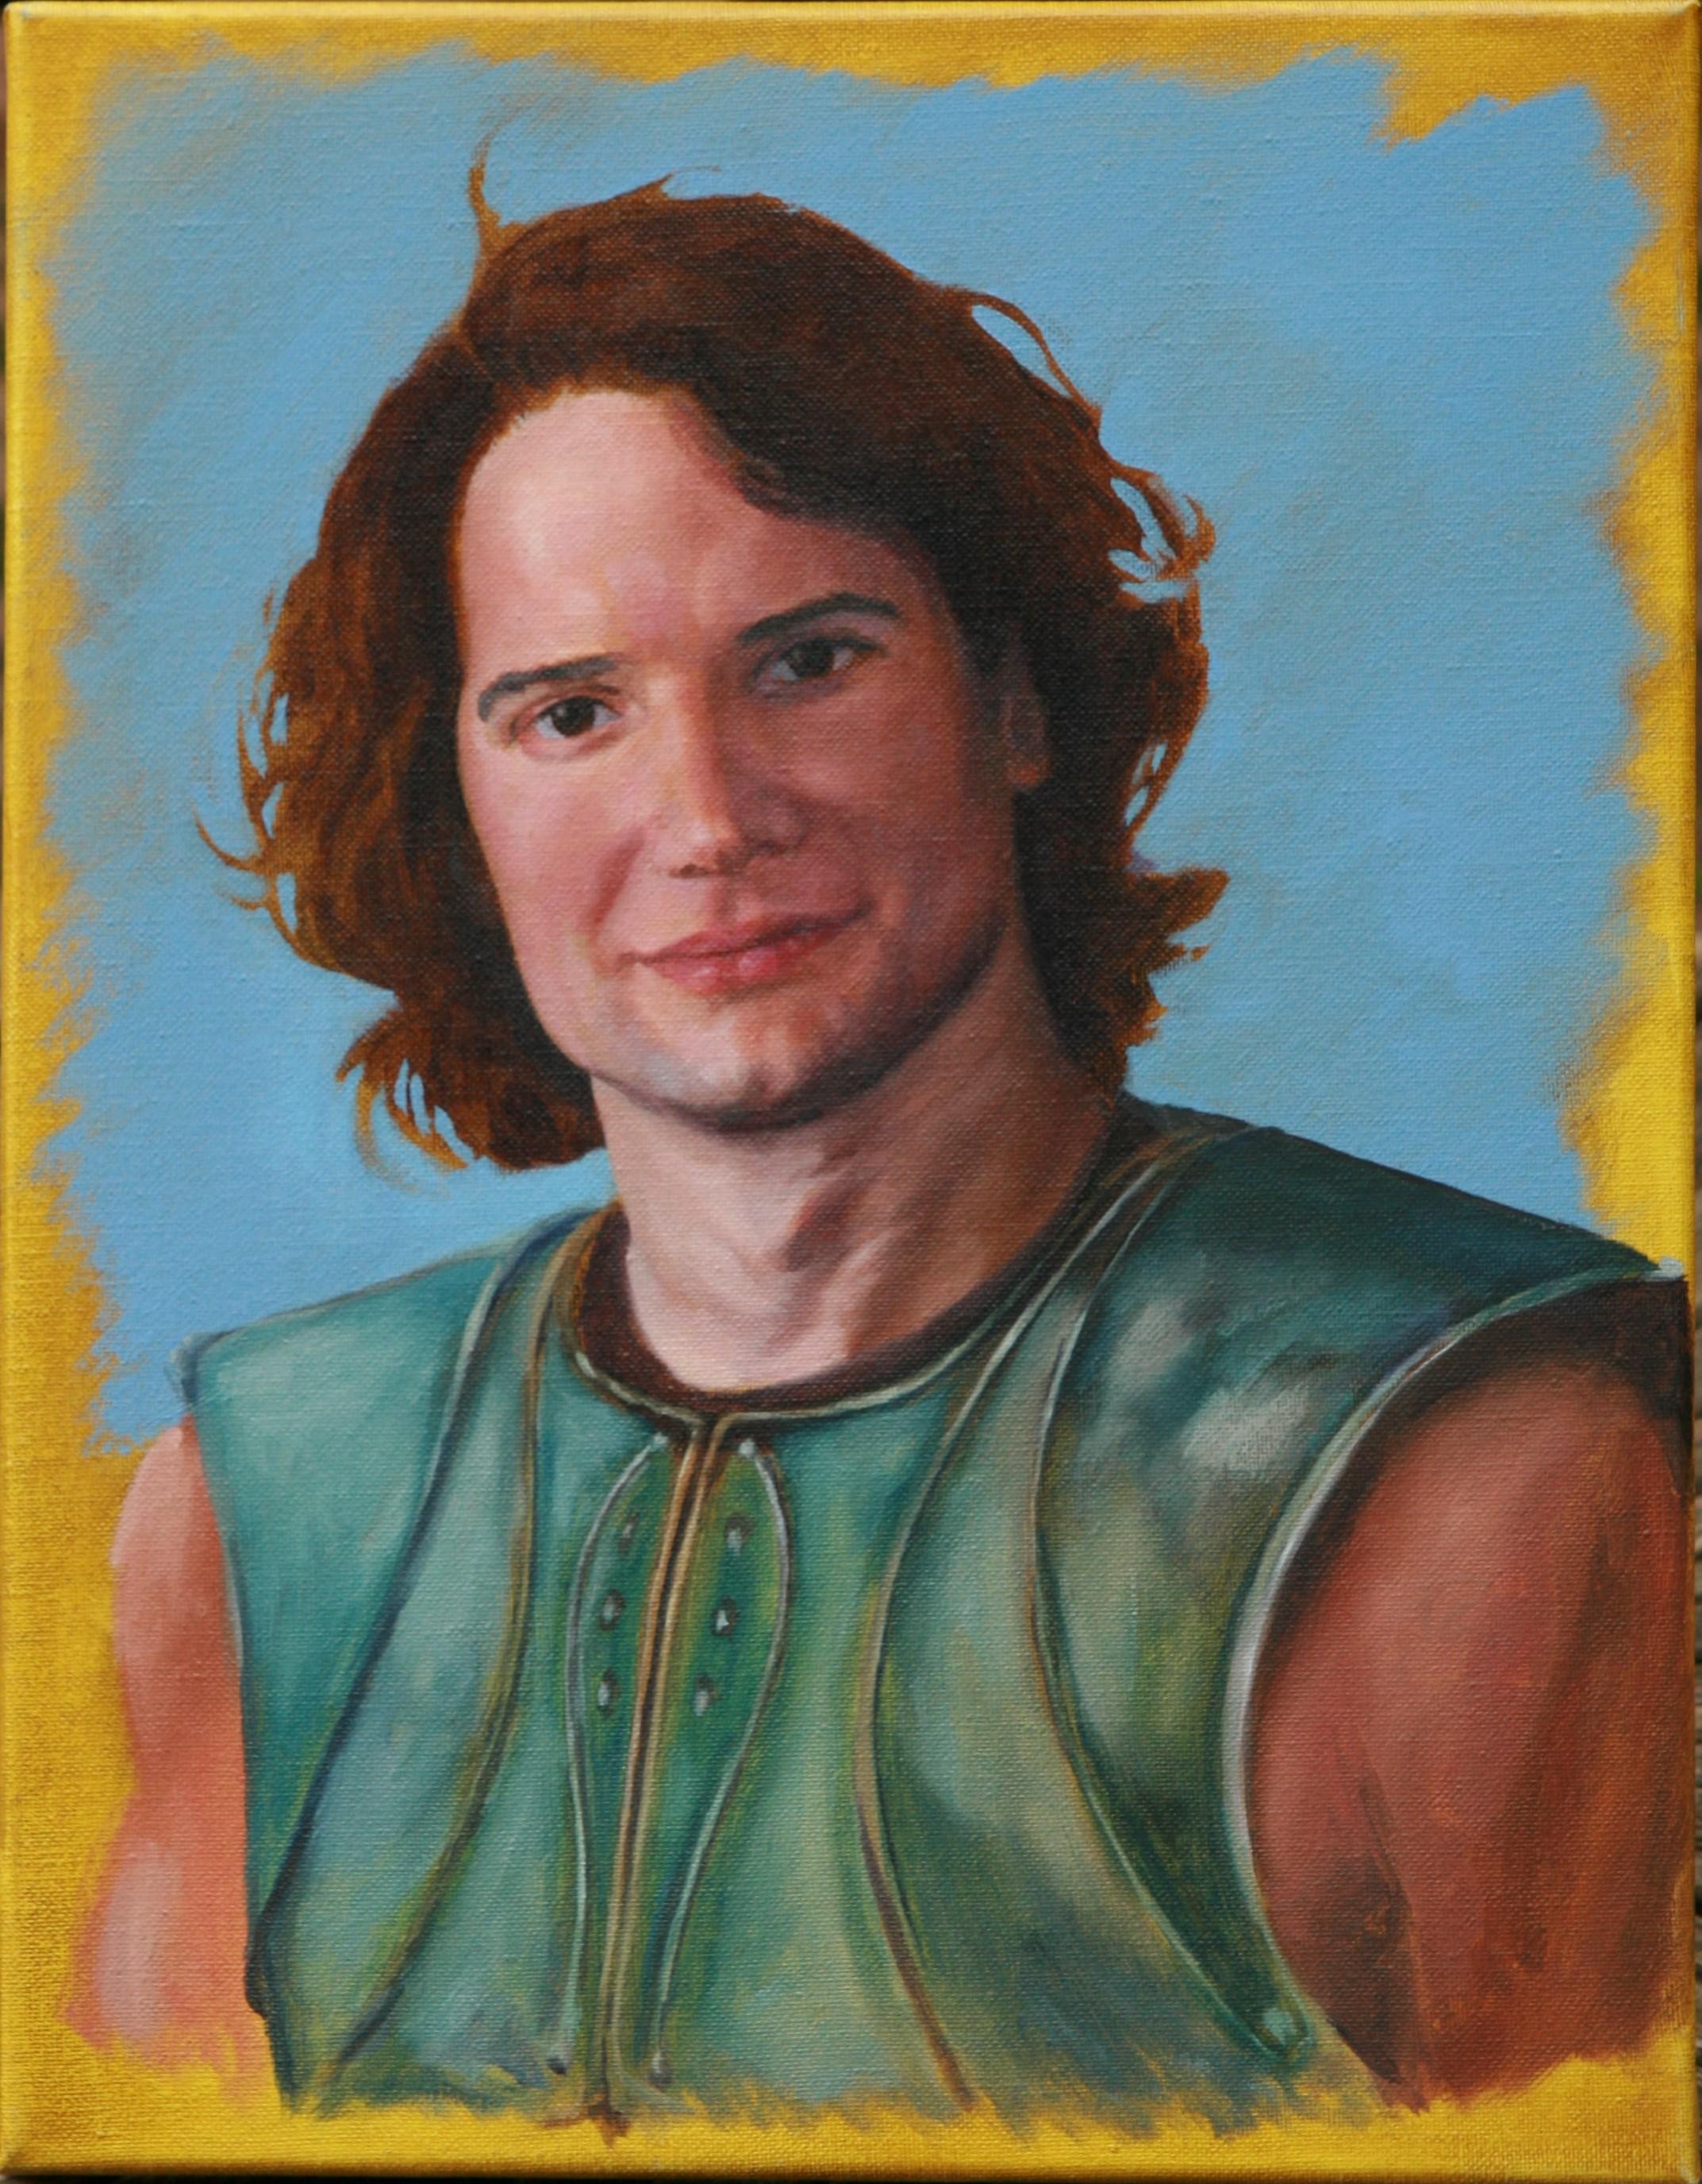 Mythical Portrait of Daryl